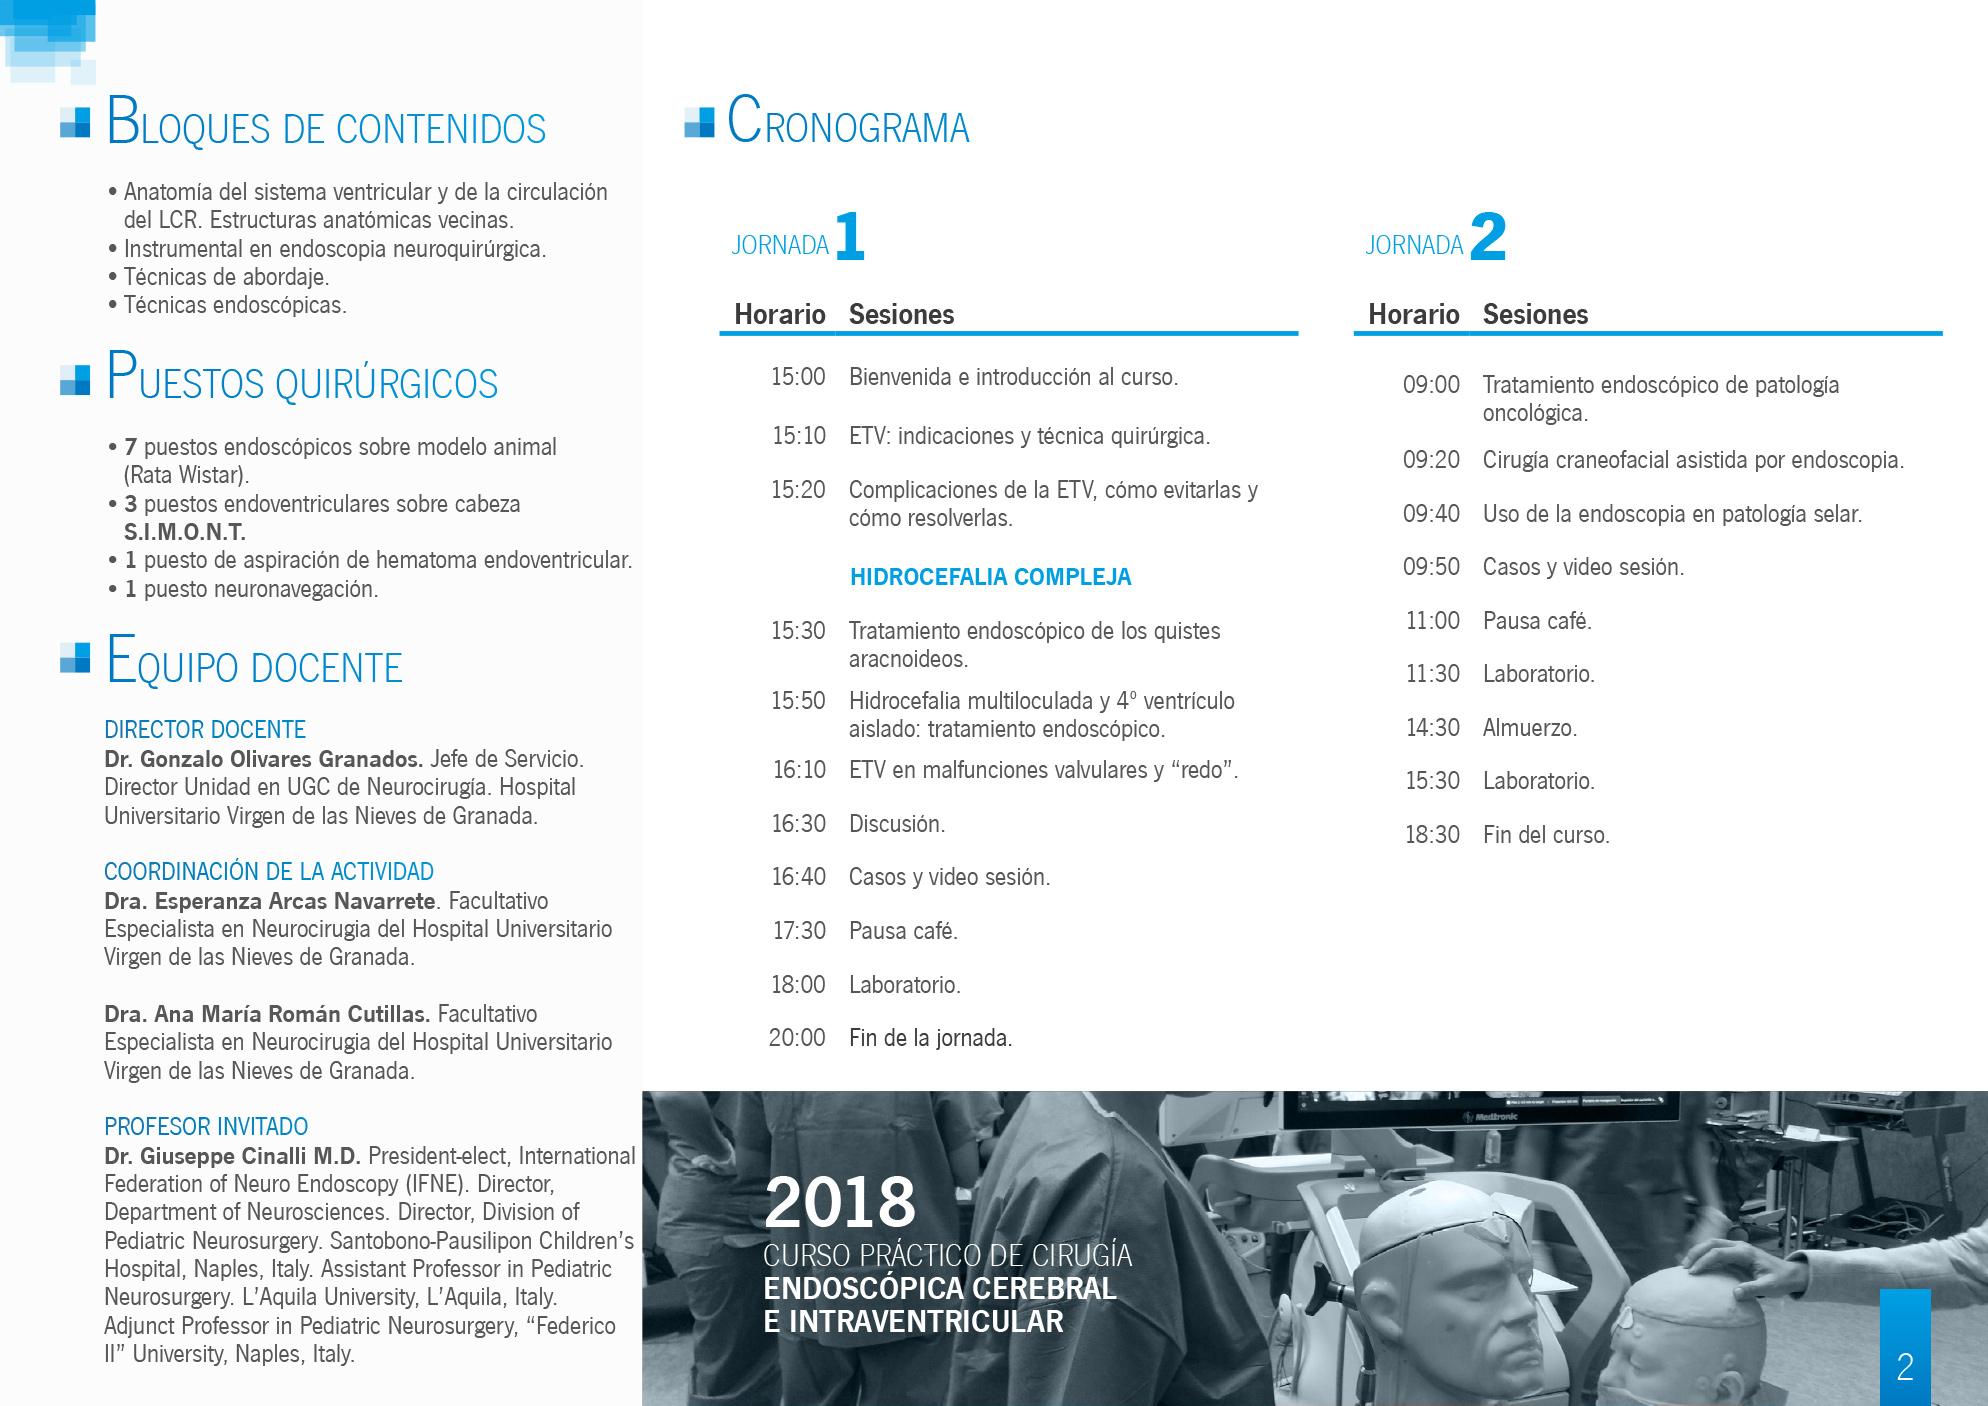 2018-NOV-cirugia-endoscopica-cerebral-1900px-3